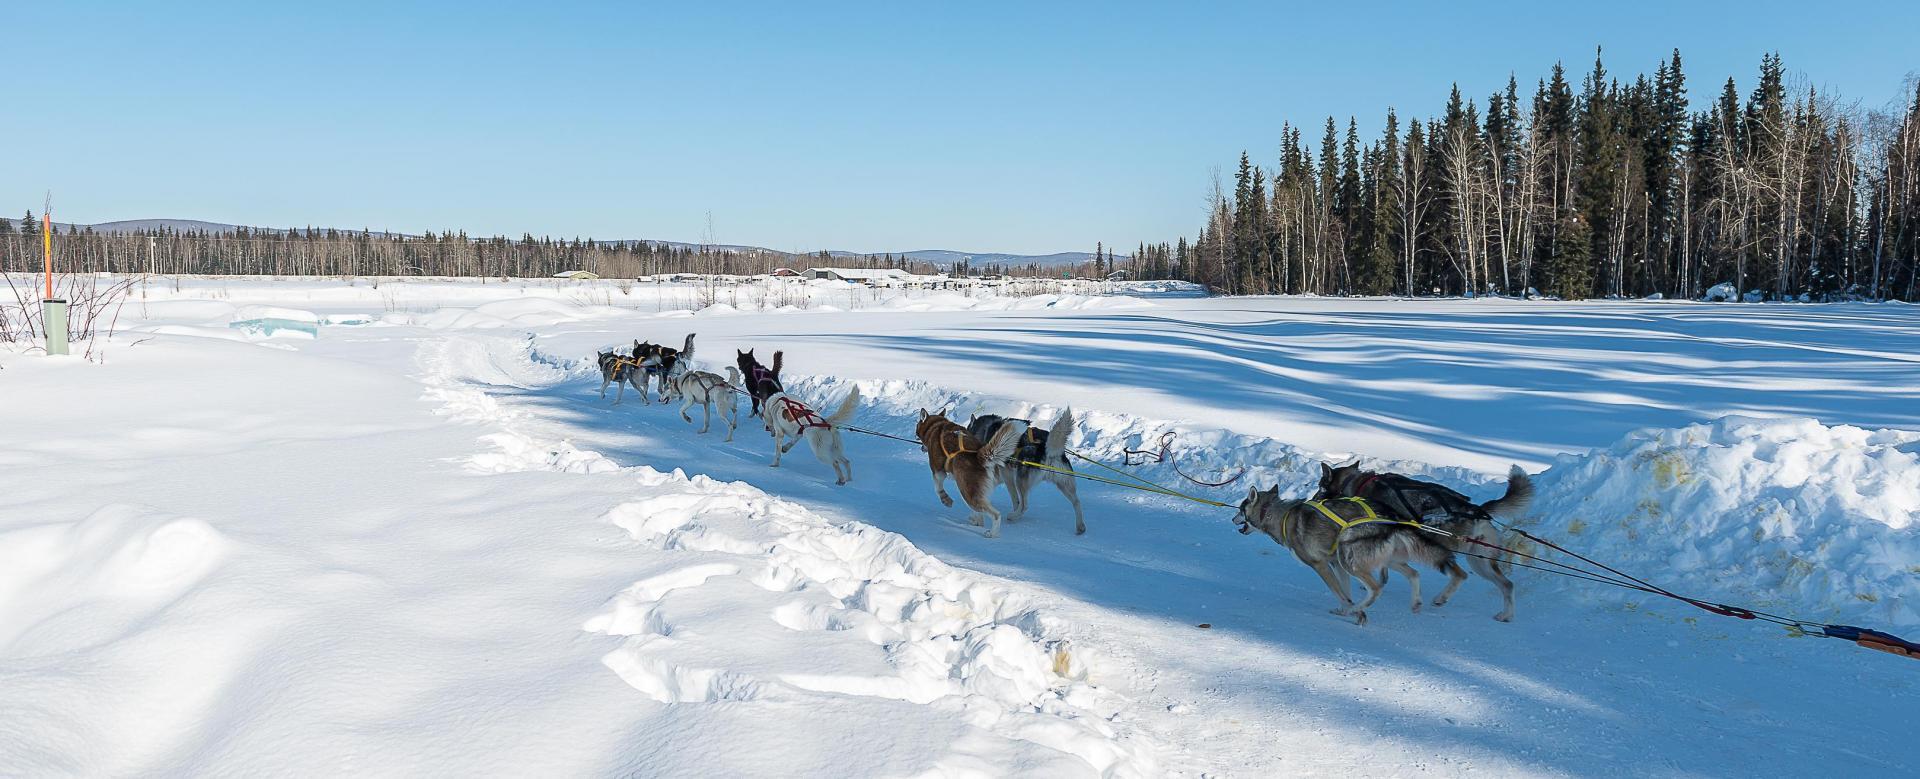 chien de traineaux canada quebec - qu u00e9bec   aventure en tra u00eeneau  u00e0 chiens